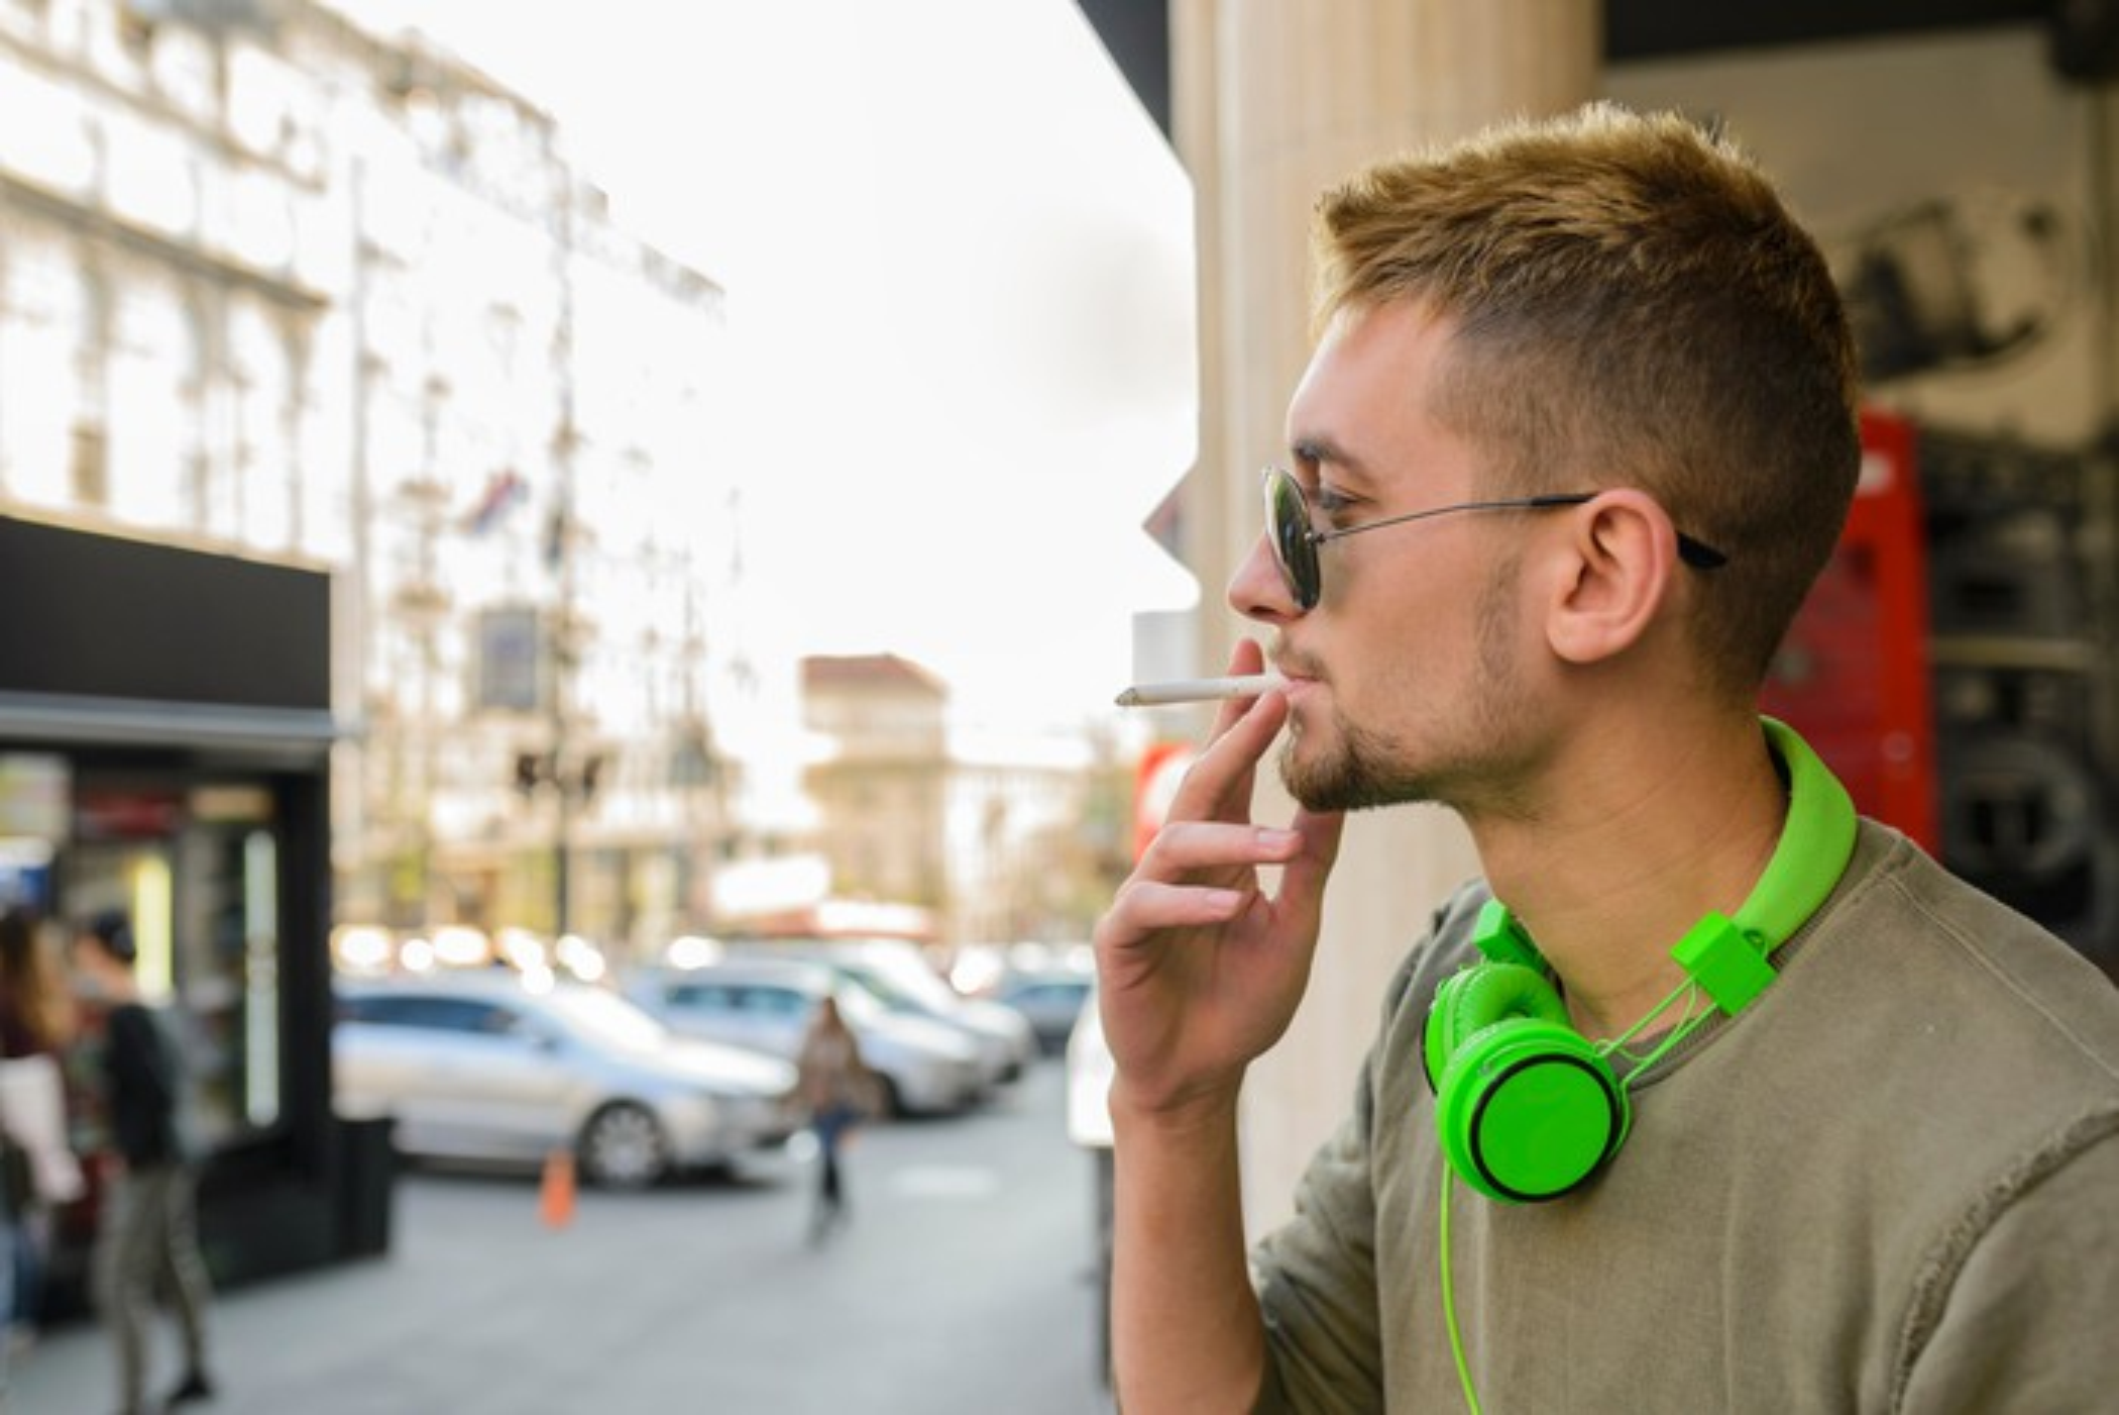 Man with green headphones smoking cigarette